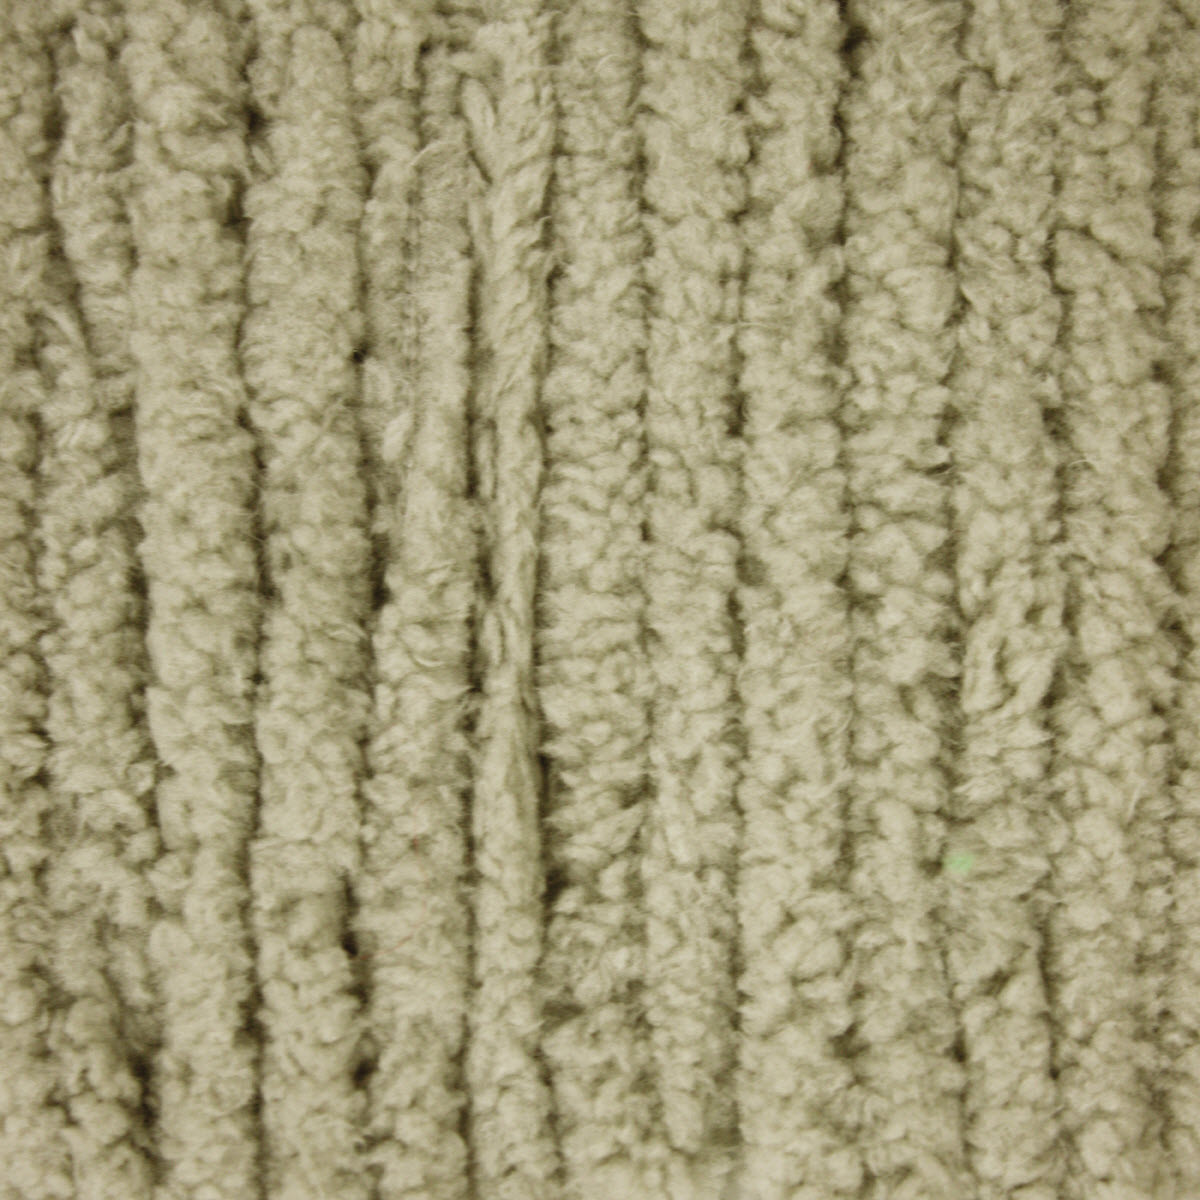 Bernat Baby Dove Baby Blanket Yarn (6 - Super Bulky), Free Shipping